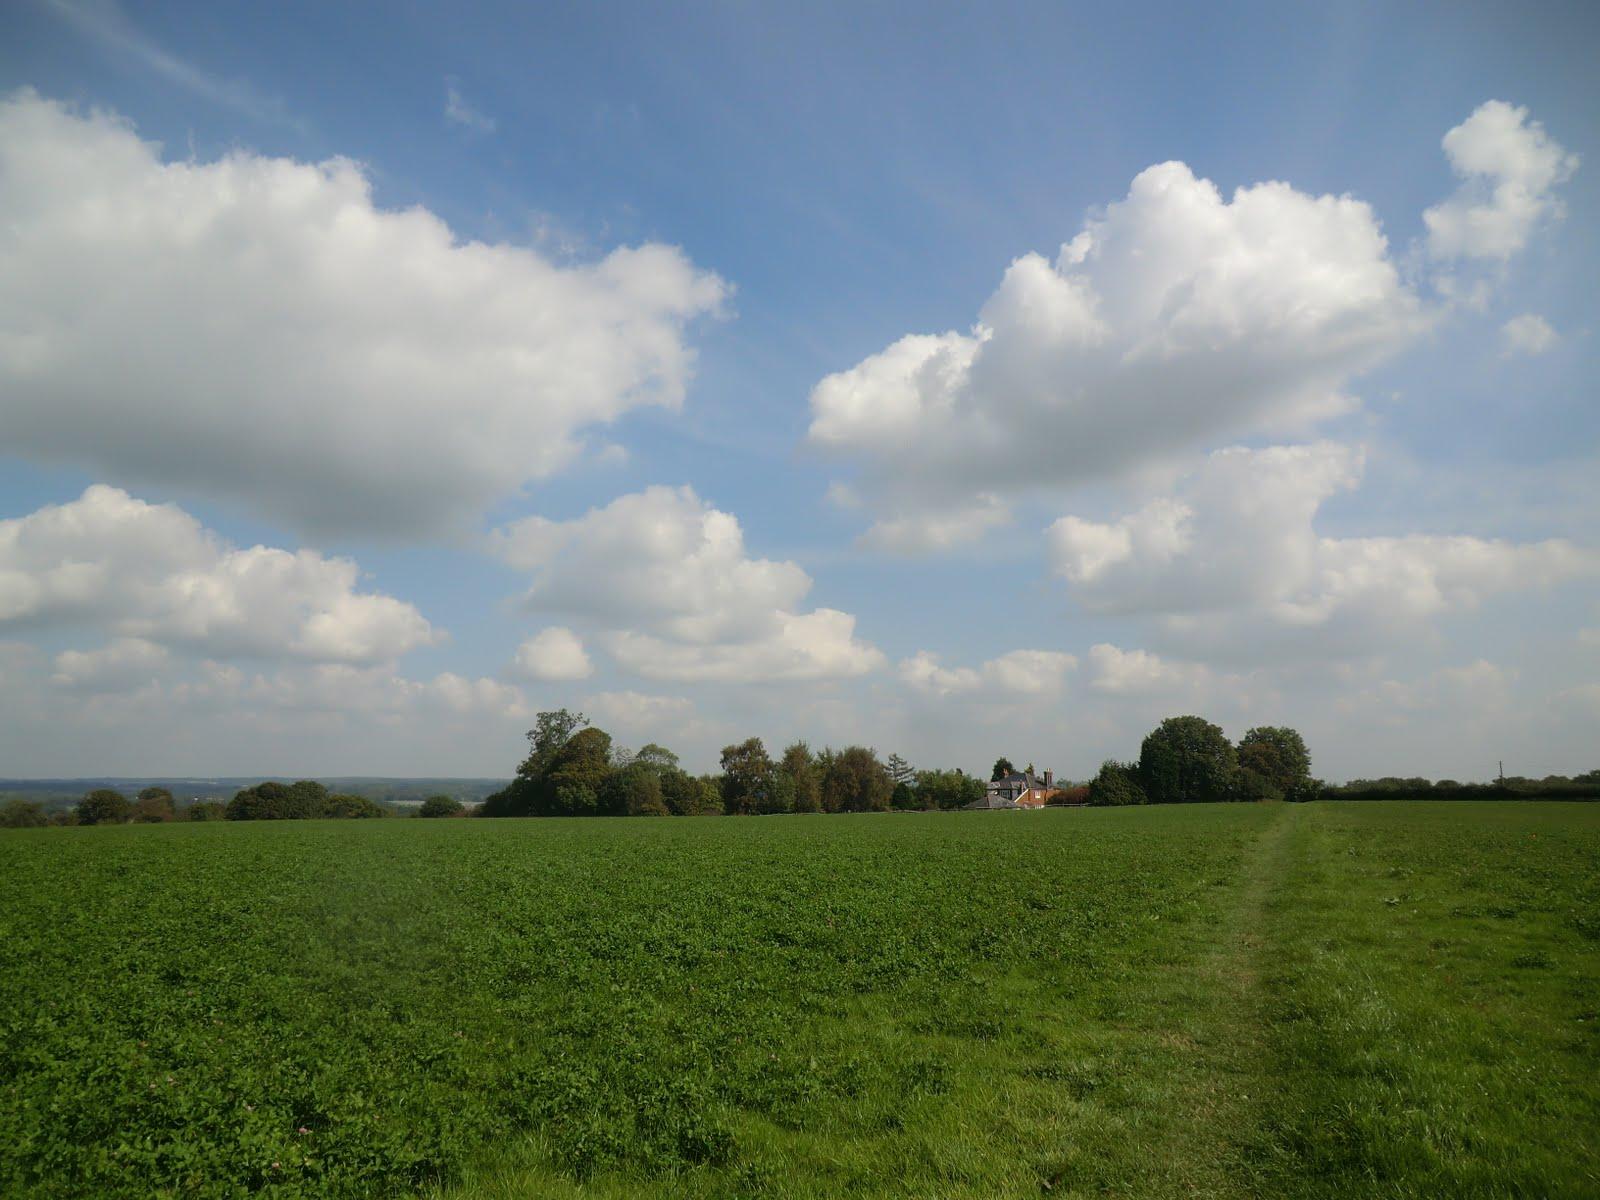 CIMG4679 Across an open field on the SOVW